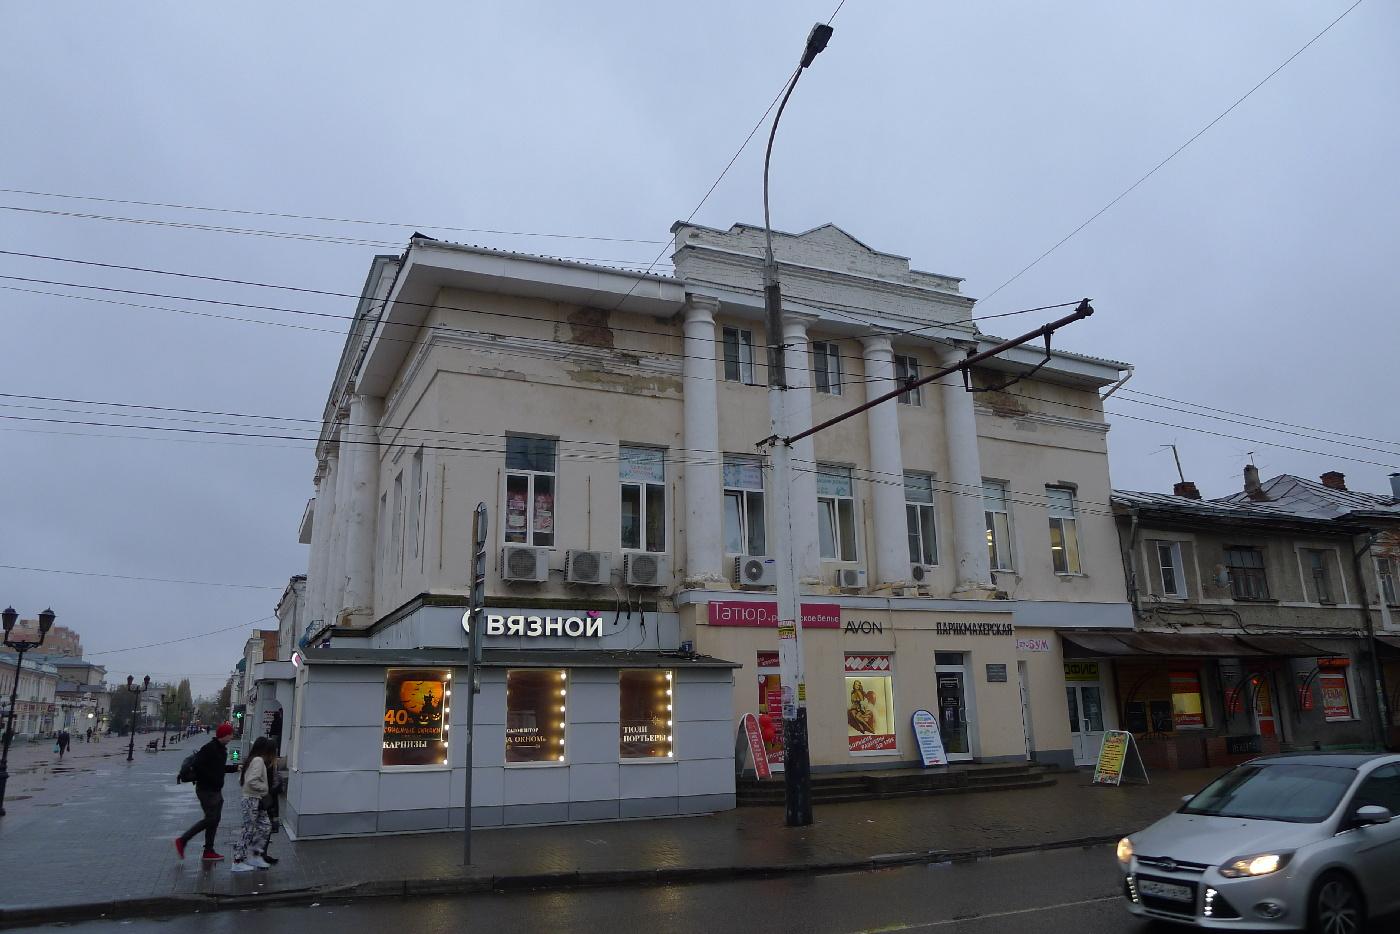 Русский Юг: Тамбов (Усадьба Асеевых, город) P1100366